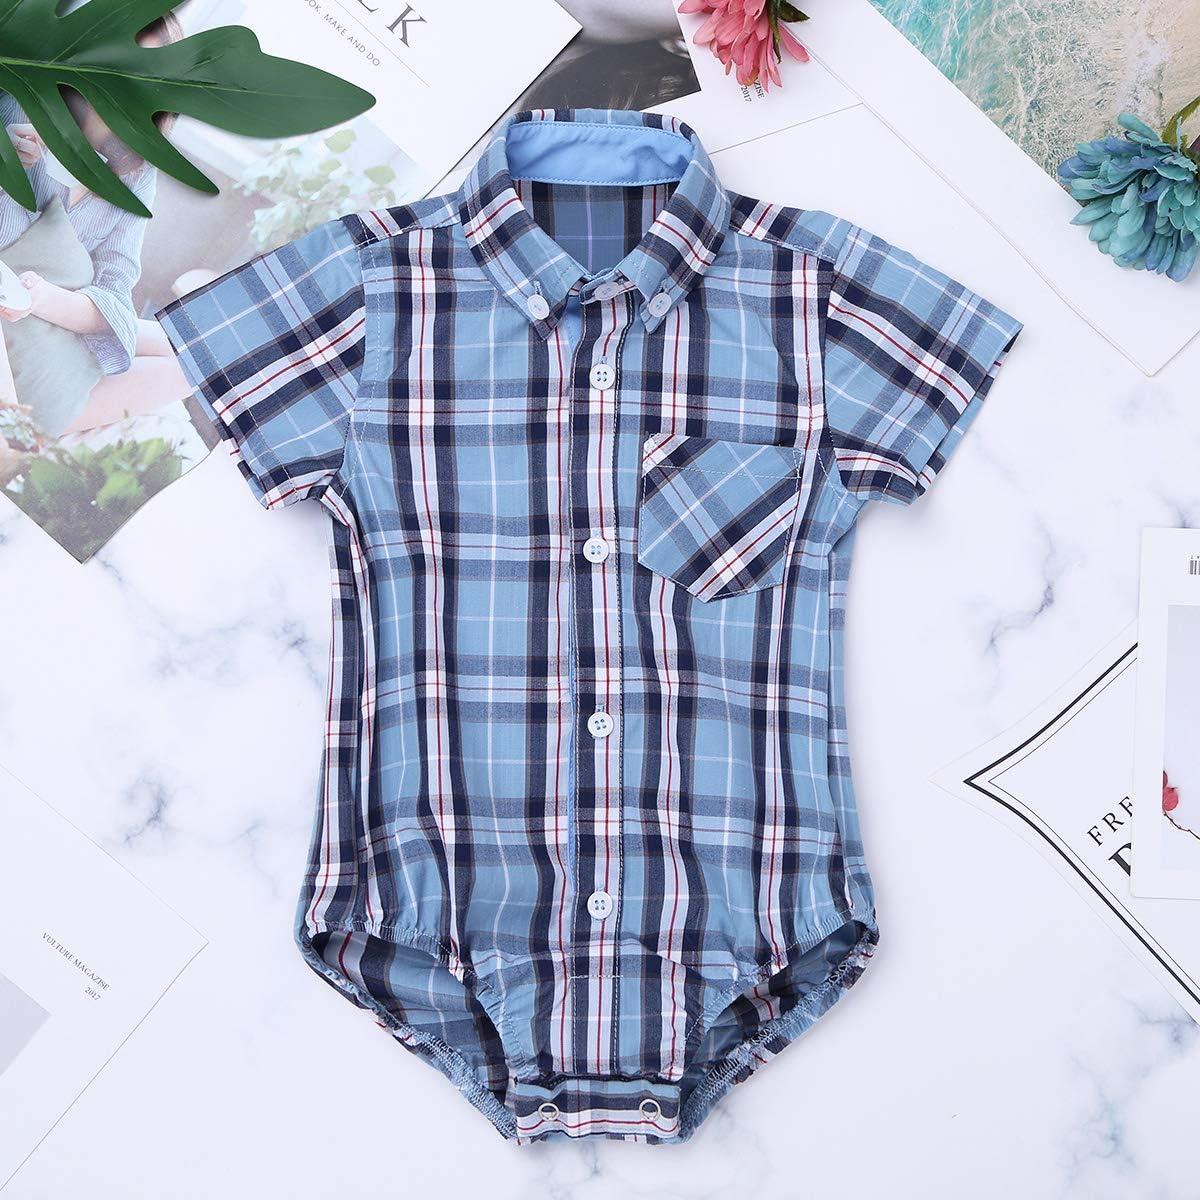 Freebily Baby Boys Girls Short Sleeve Collar Plaid Shirt Bodysuit Button Down Shirt Tops Blouse